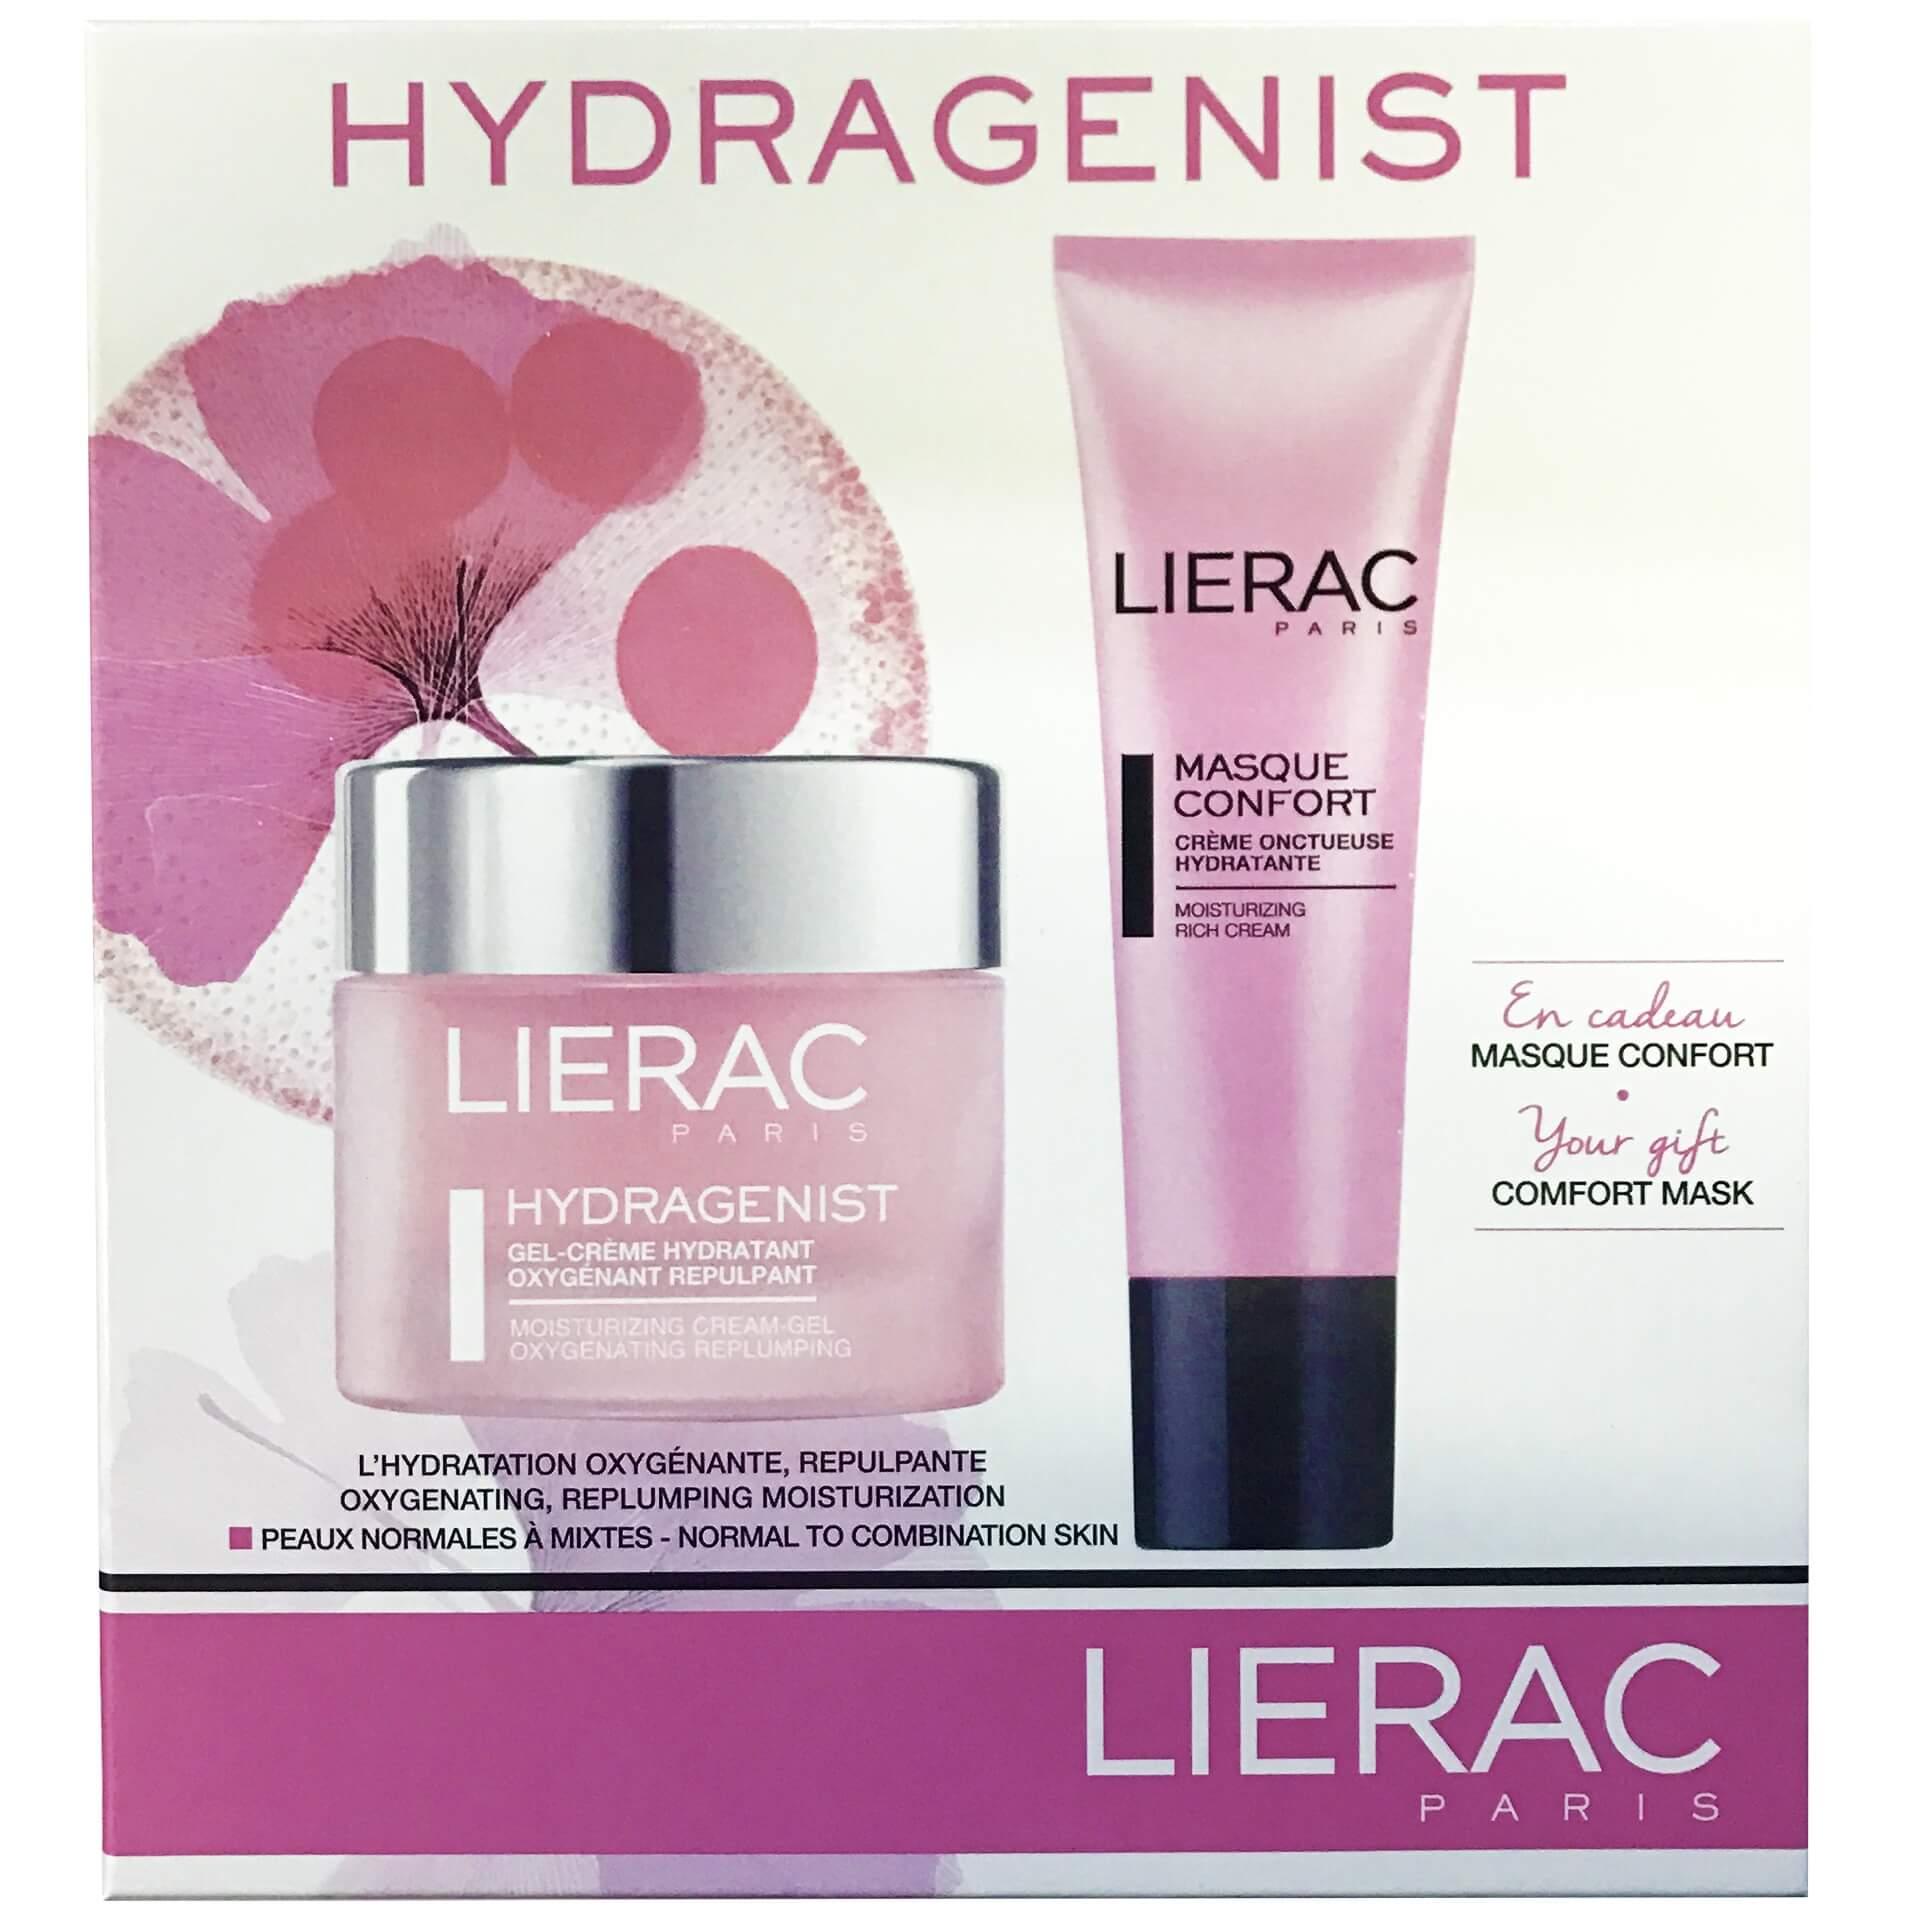 Lierac Πακέτο Προσφοράς Hydragenist Gel-Cream 50mlΚρέμα-Ζελ Προσώπου Ενυδάτωσης&Masque Confort Ενυδατική Μάσκα Προσώπου50ml